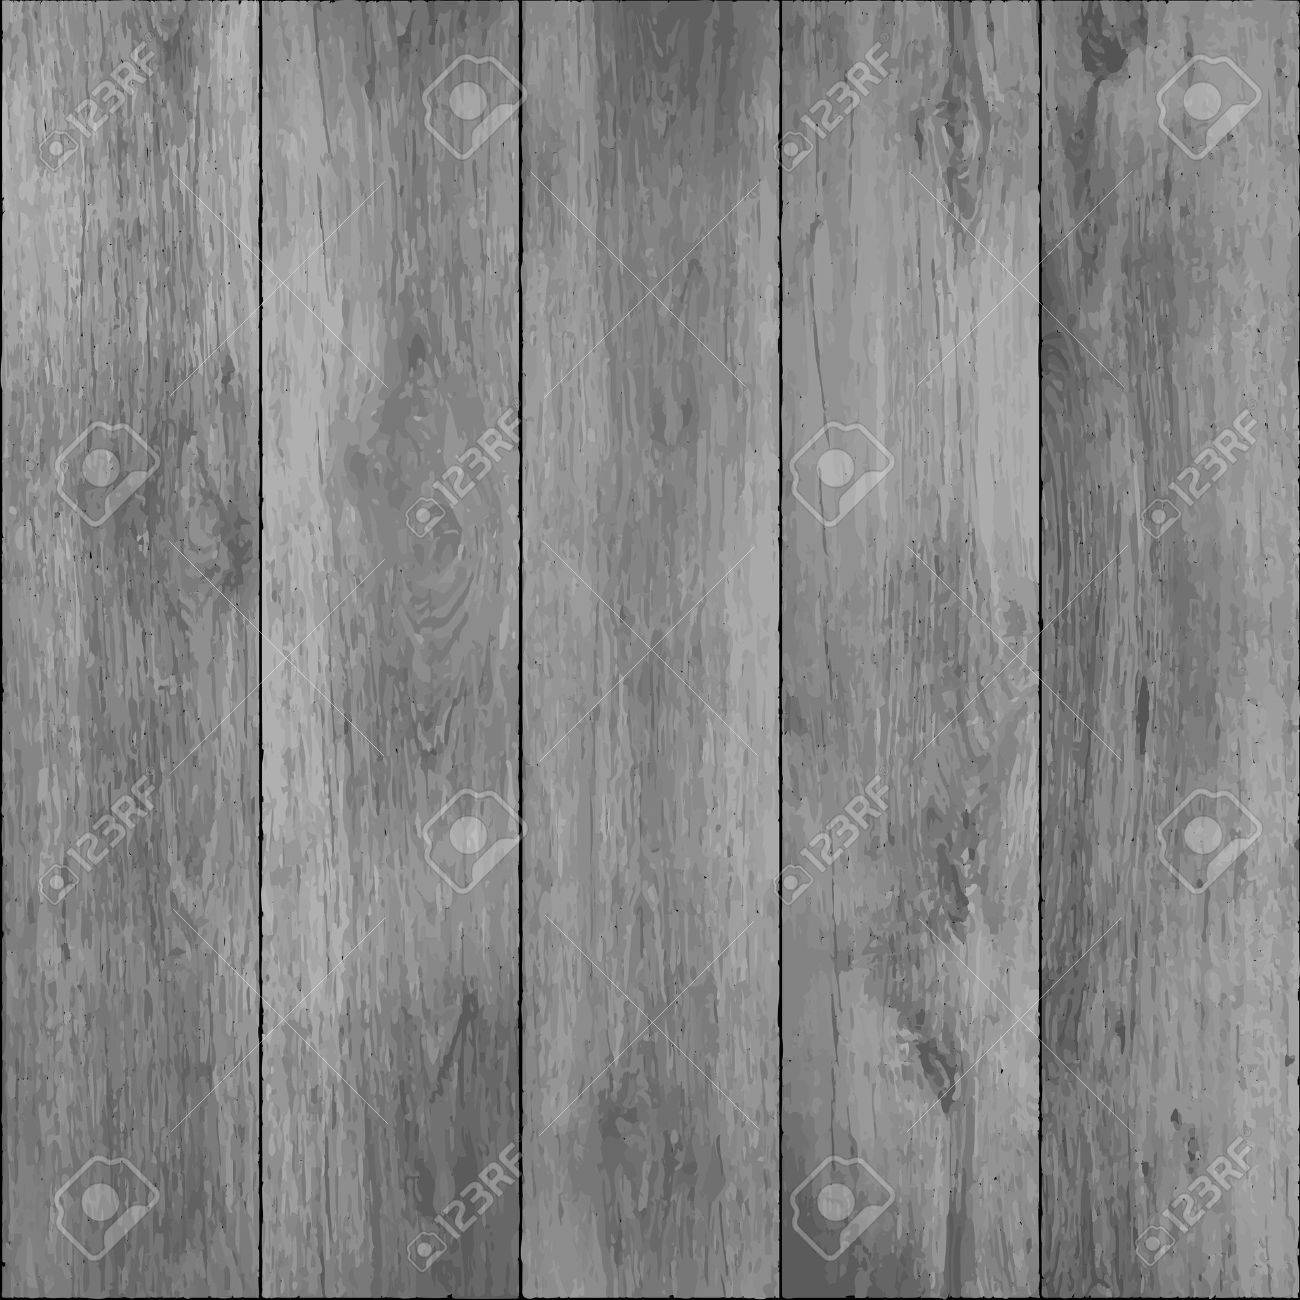 Parkett textur grau  Holz Textur Holzboden. Lizenzfrei Nutzbare Vektorgrafiken, Clip ...